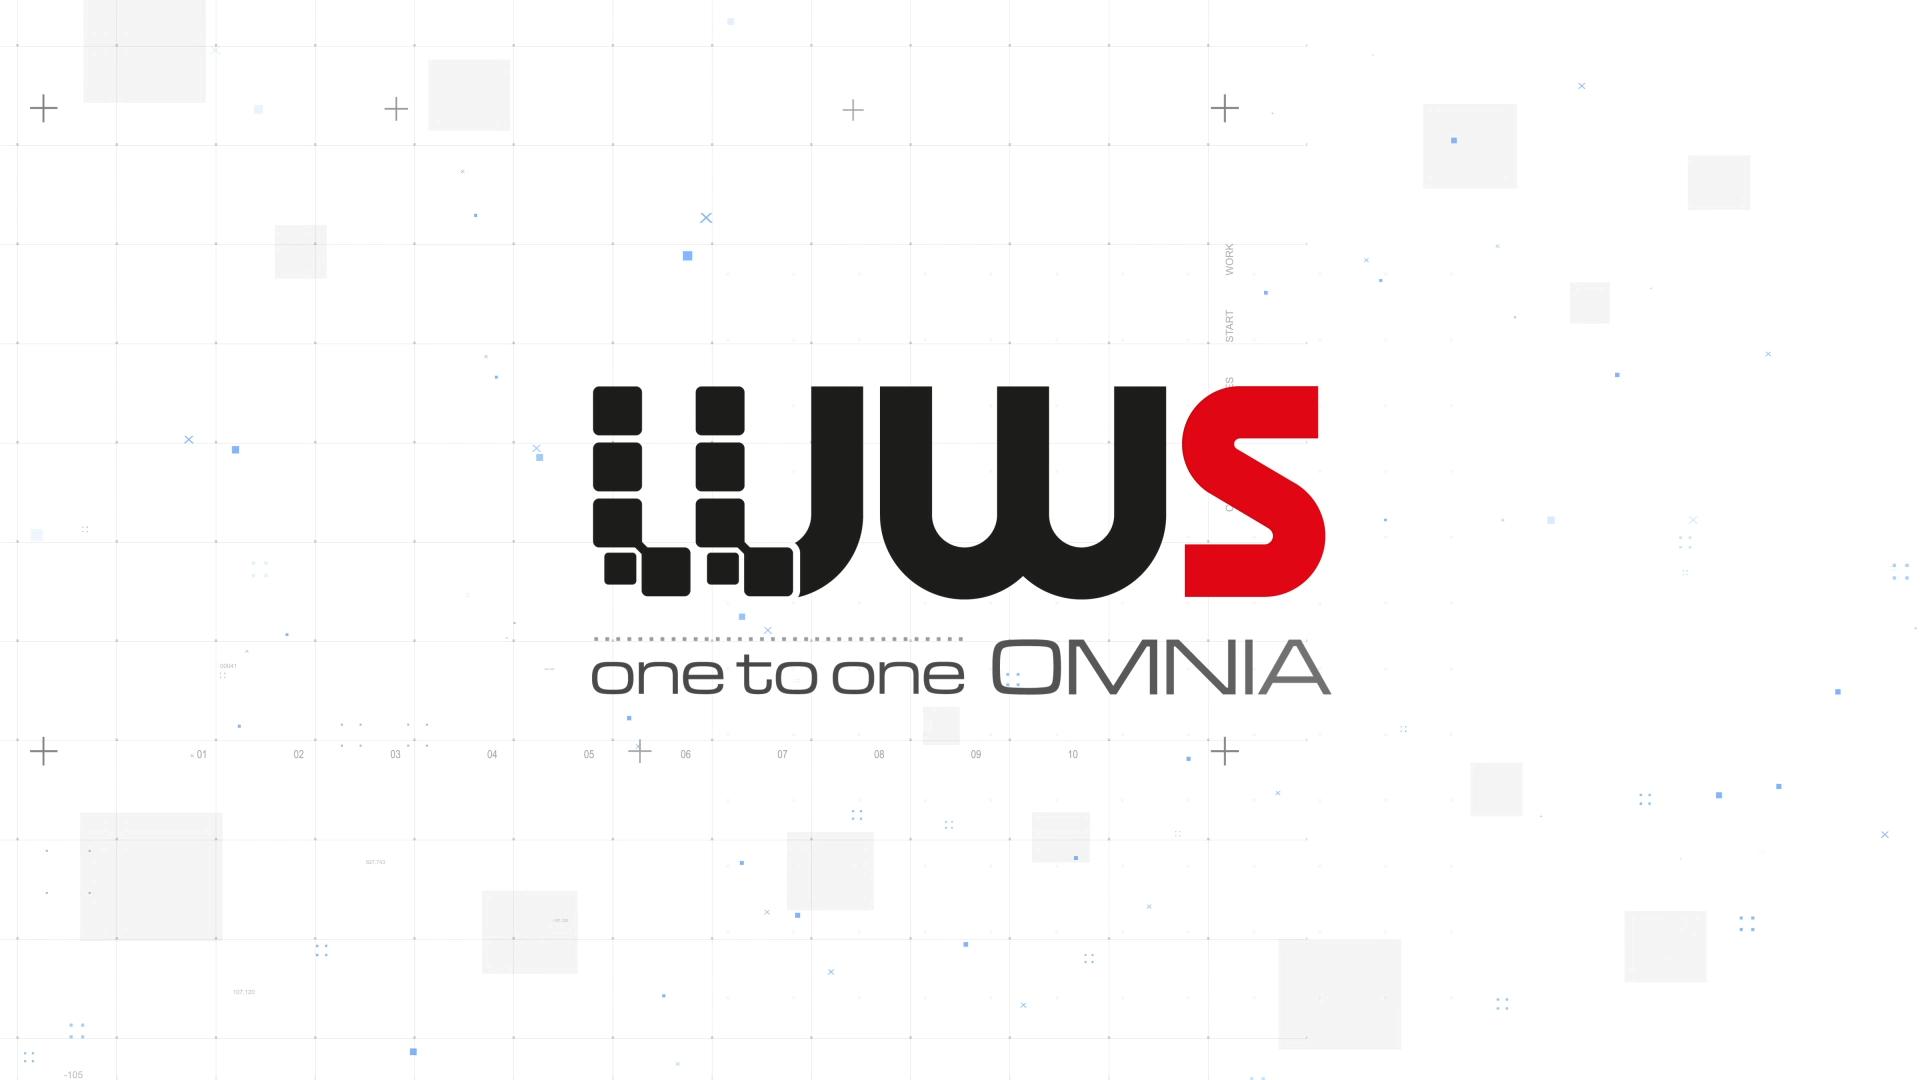 WWS OnetoOne Omnia